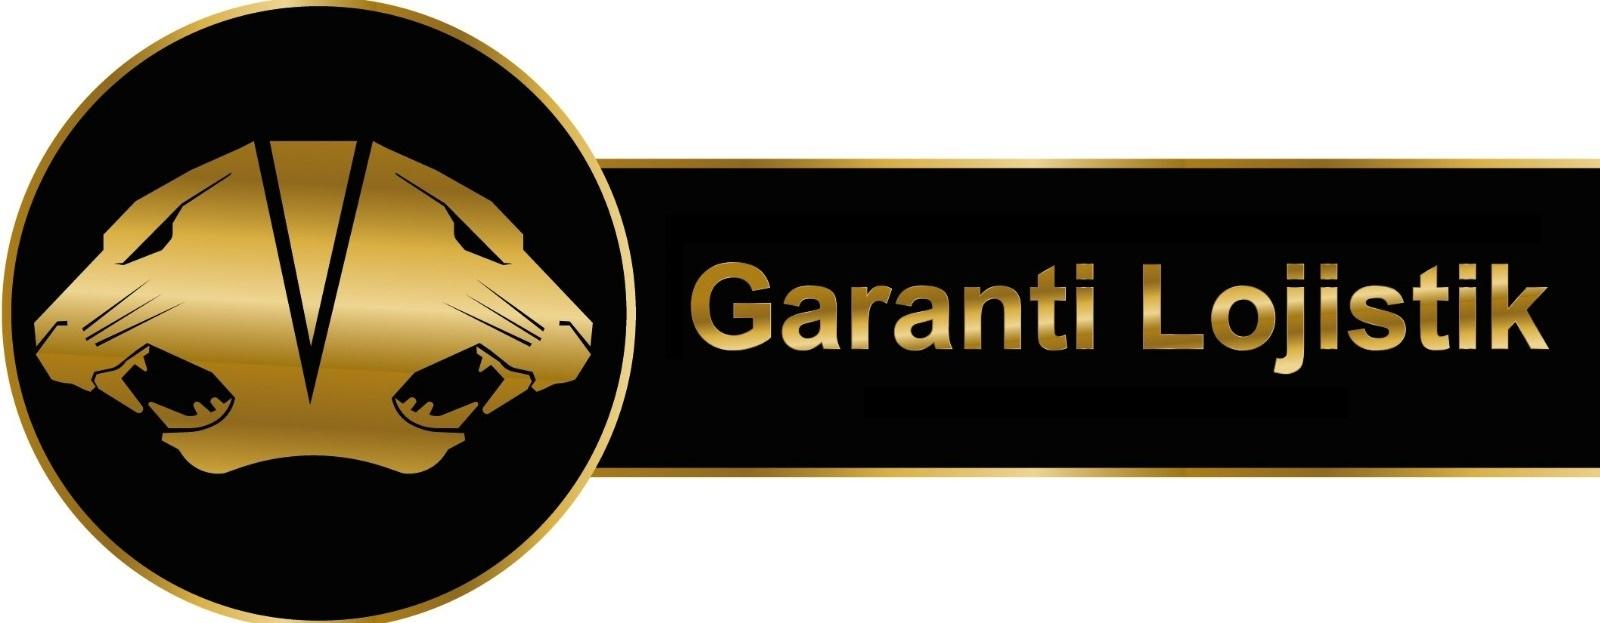 Garanti Logistic (@garantilogistics) Cover Image